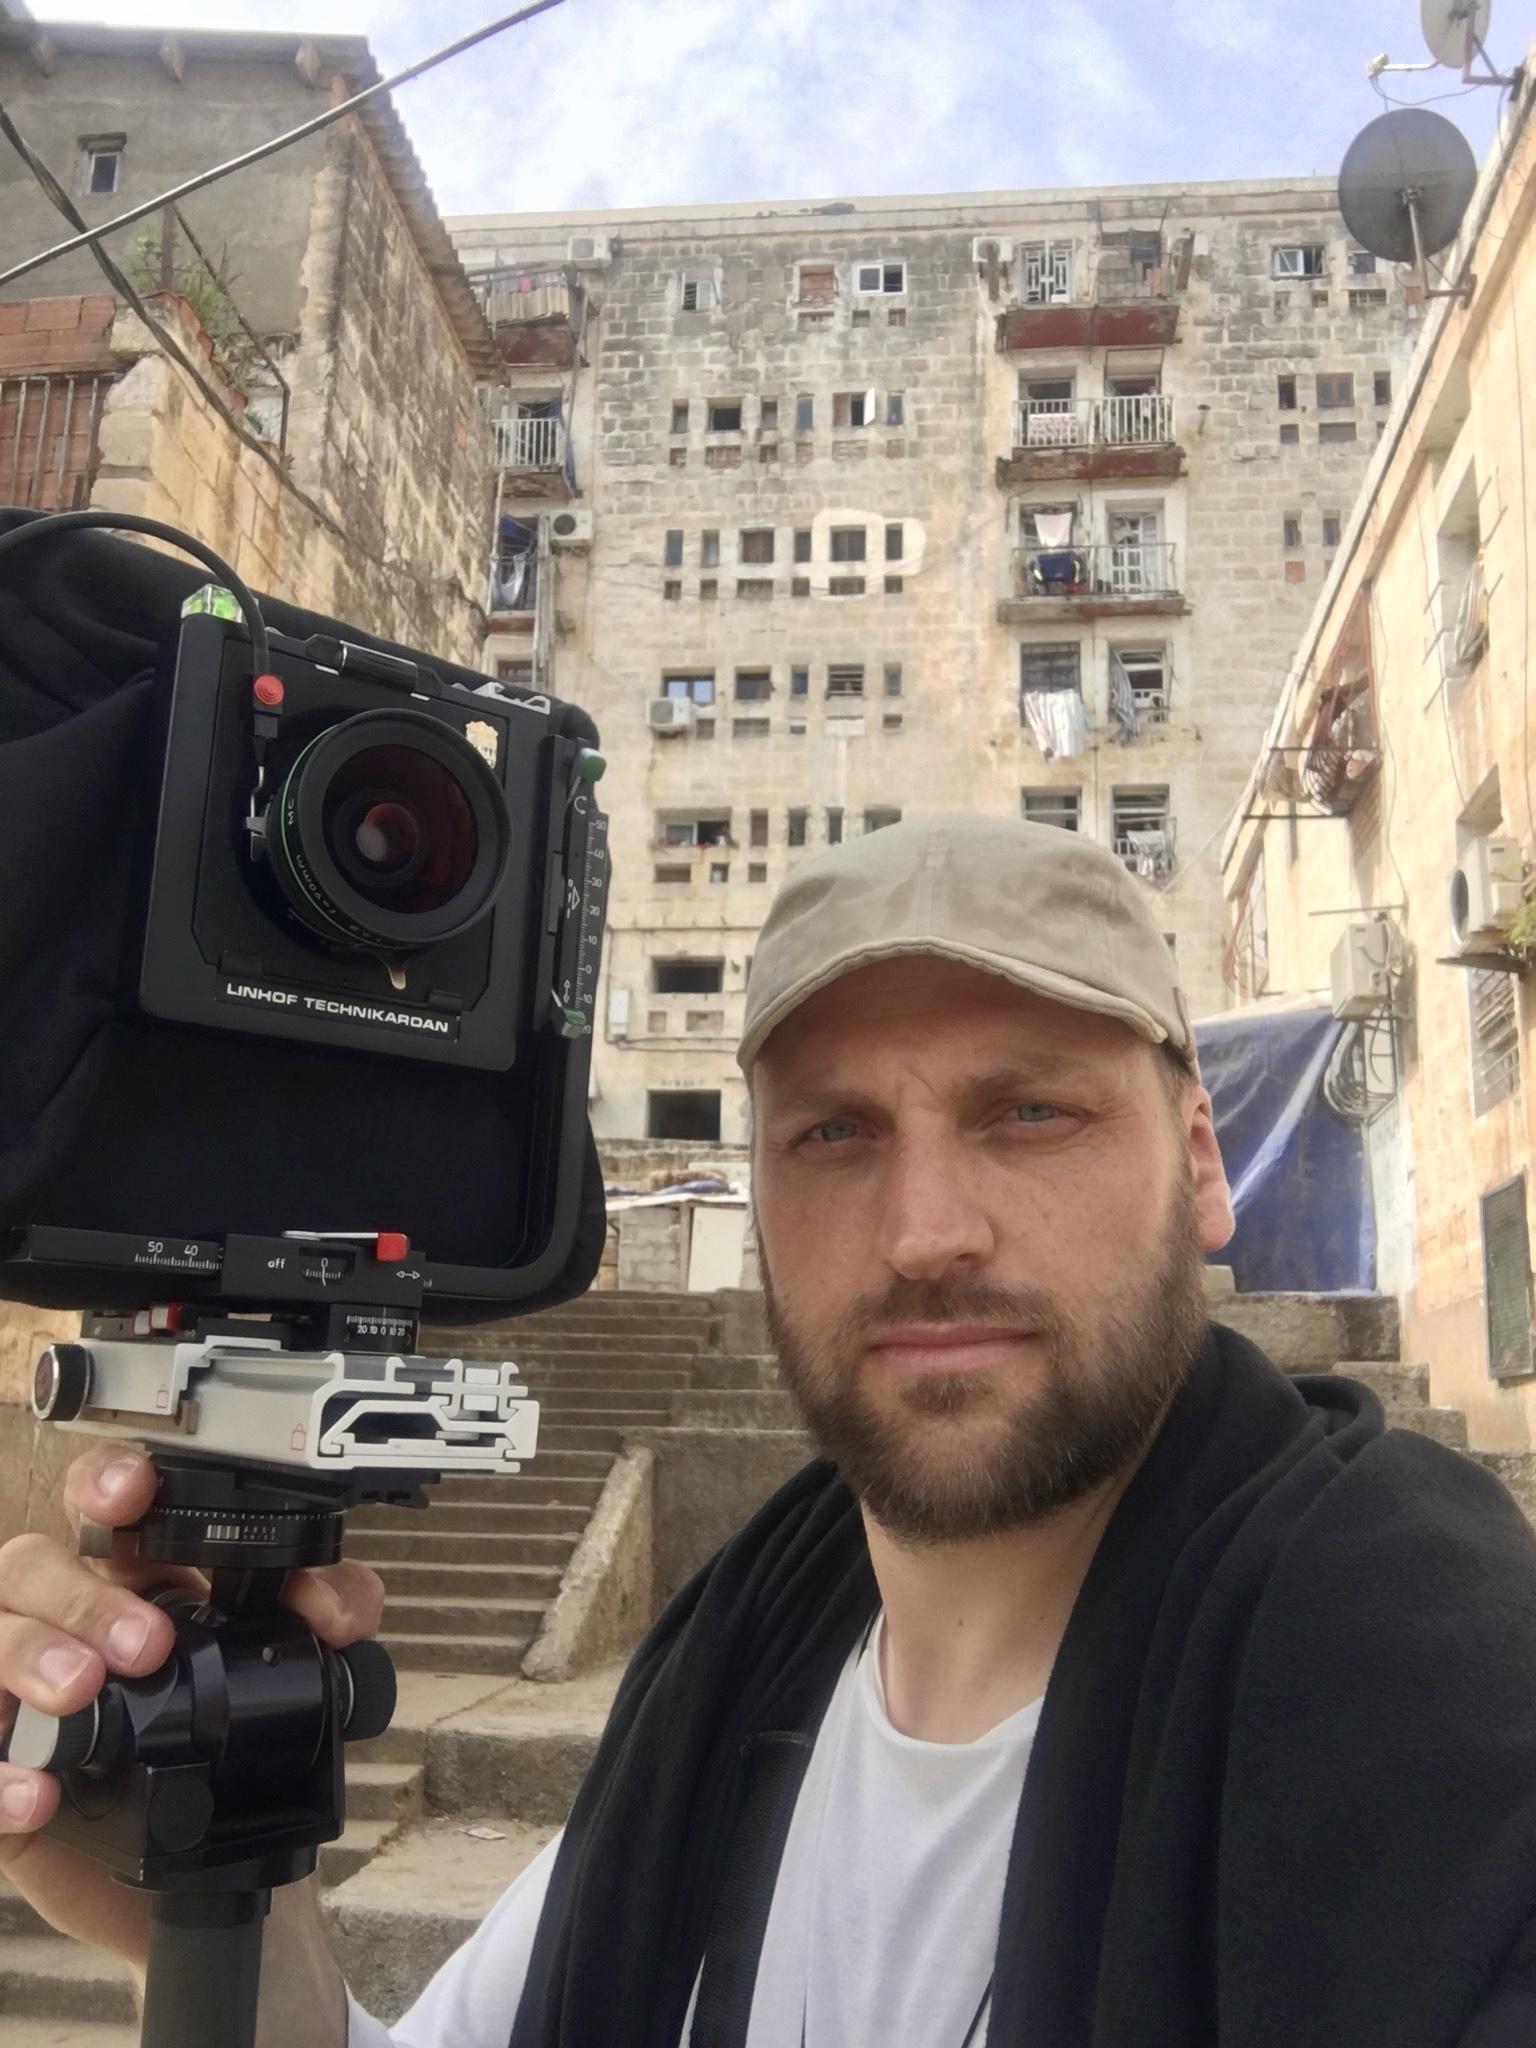 Image of Leo Fabrizio from Wikidata